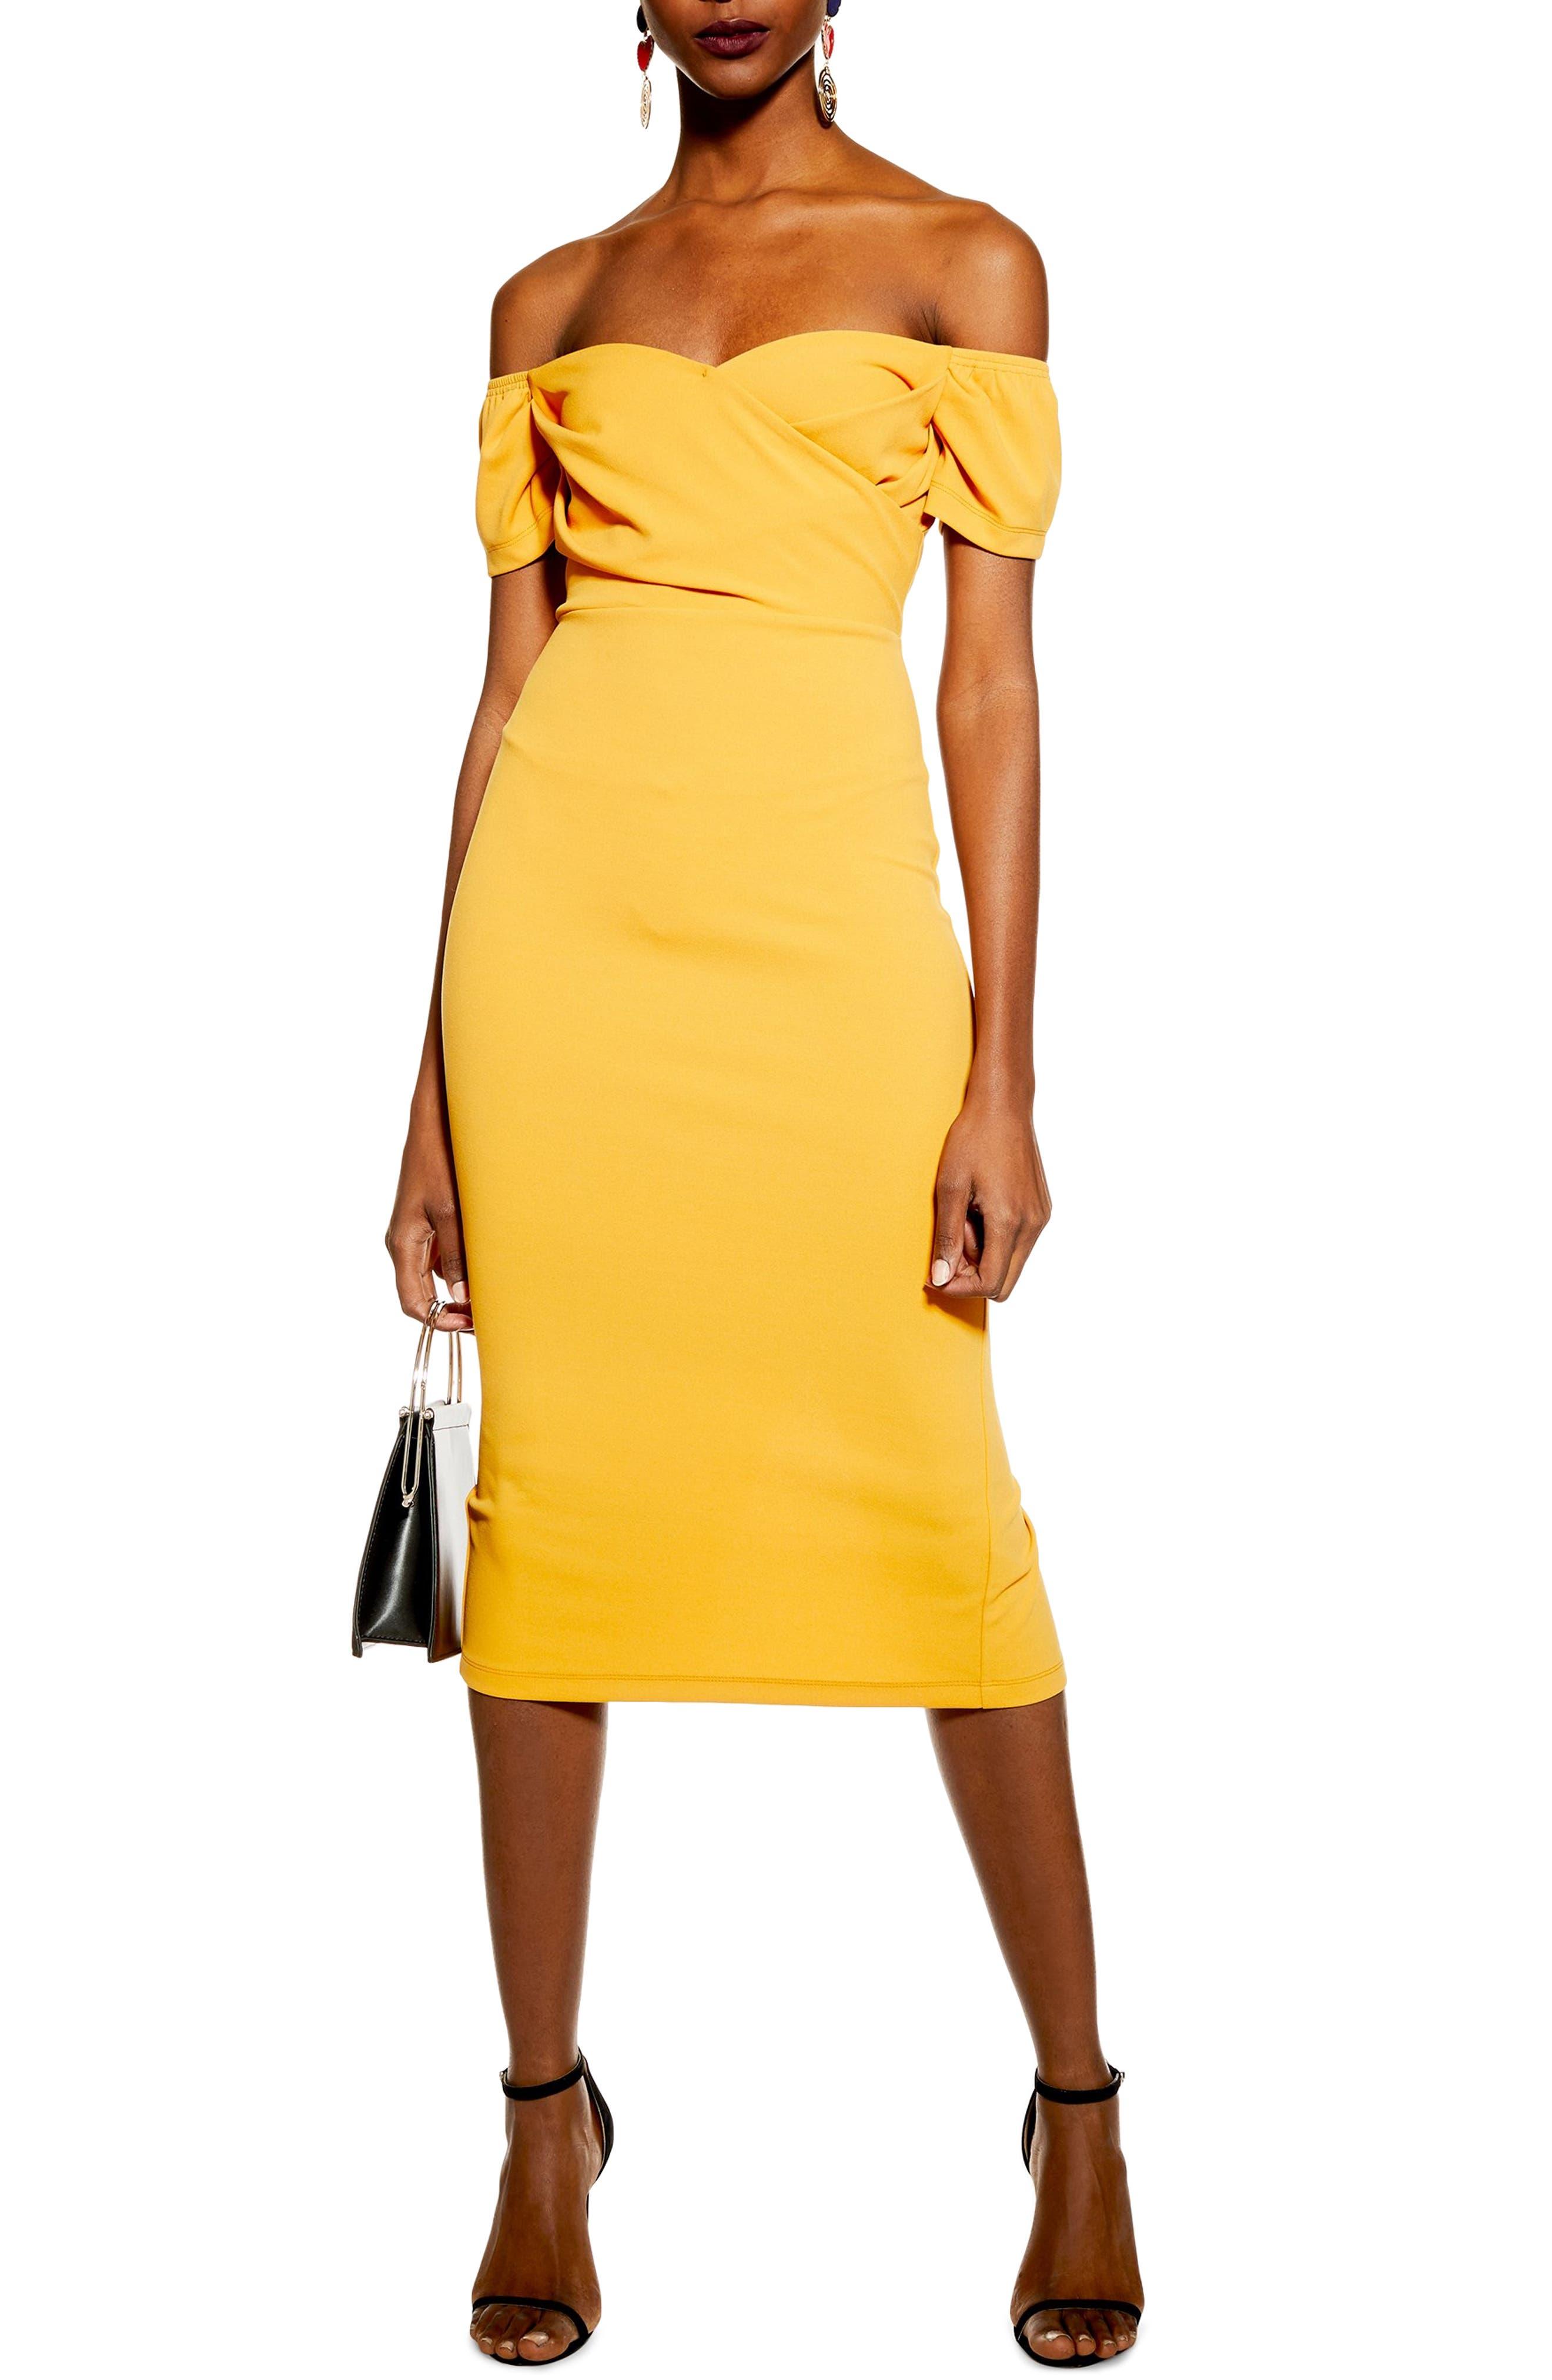 940713d804 Topshop Off The Shoulder Wrap Midi Dress, US (fits like 6-8)